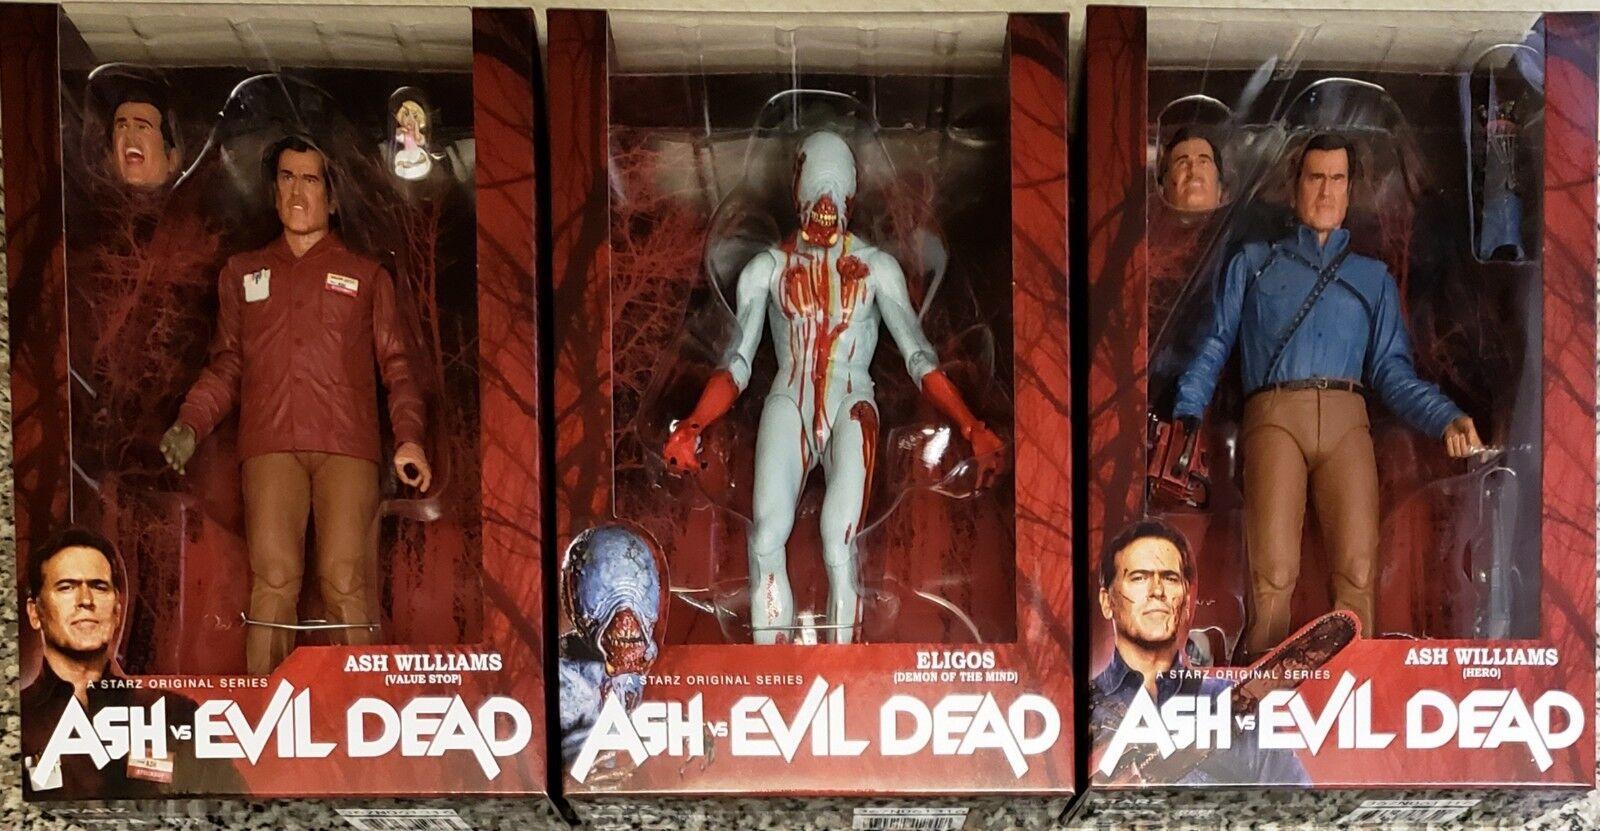 NECA ASH VS EVIL DEAD, SERIES 1 COMPLETE, VALUE STOP + HERO ASH, & ELIGOS, NEW